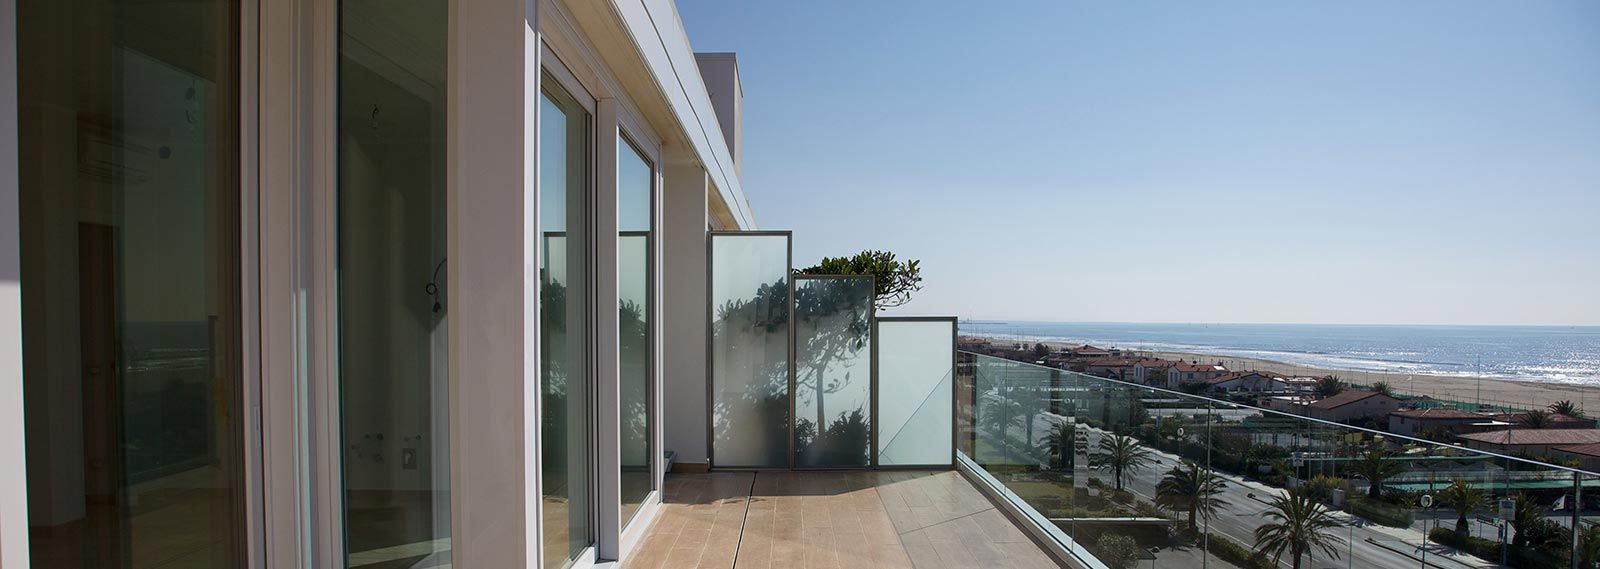 Appartamenti lido di camaiore vista mare. Vista